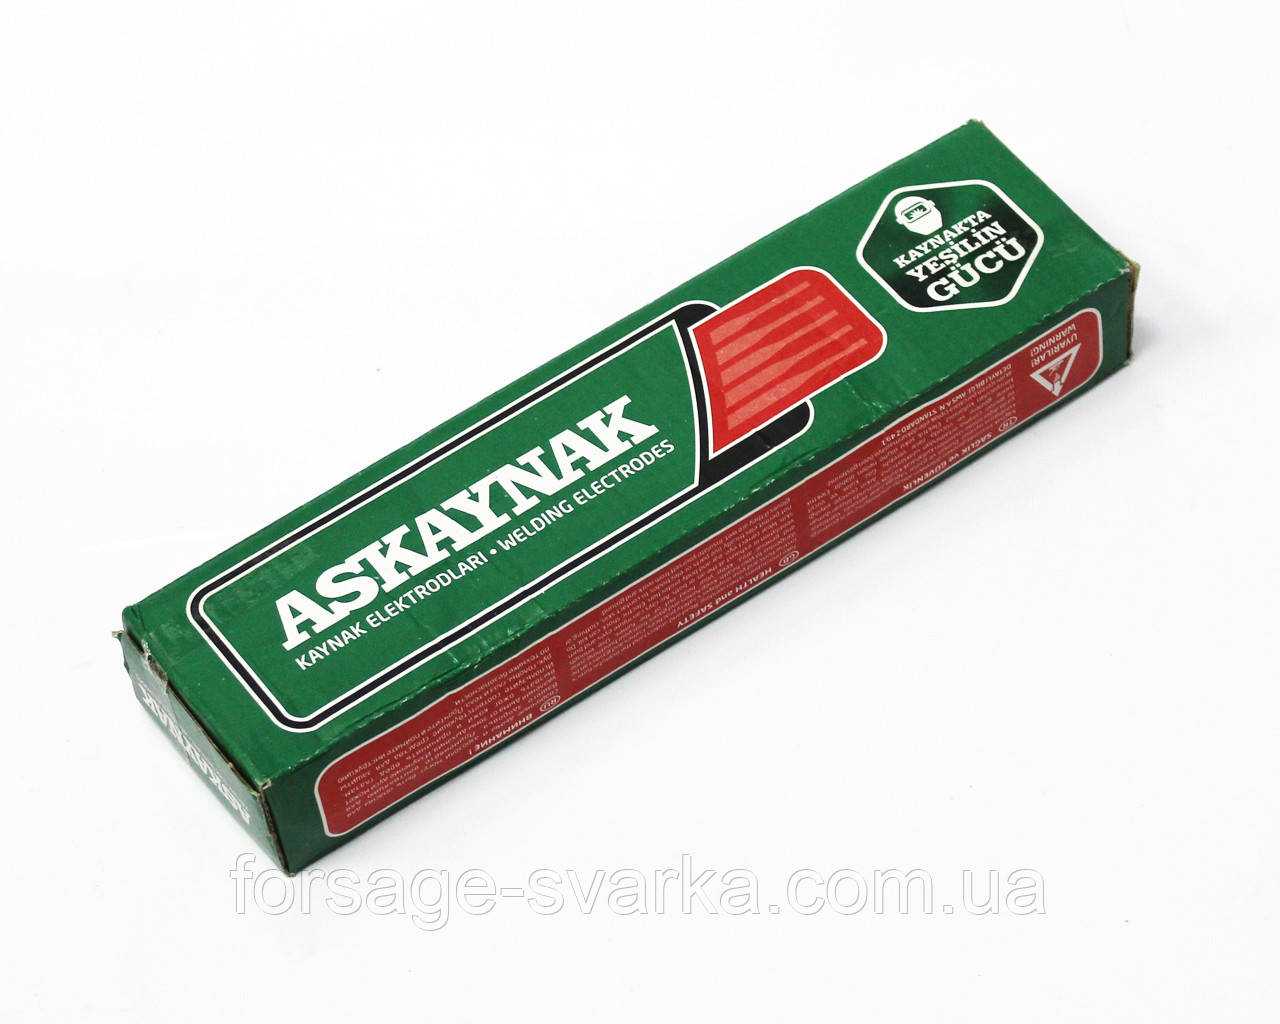 Электроды Askaynak AS P-308L Ø2.5мм, 1.8кг (для нержавейки)